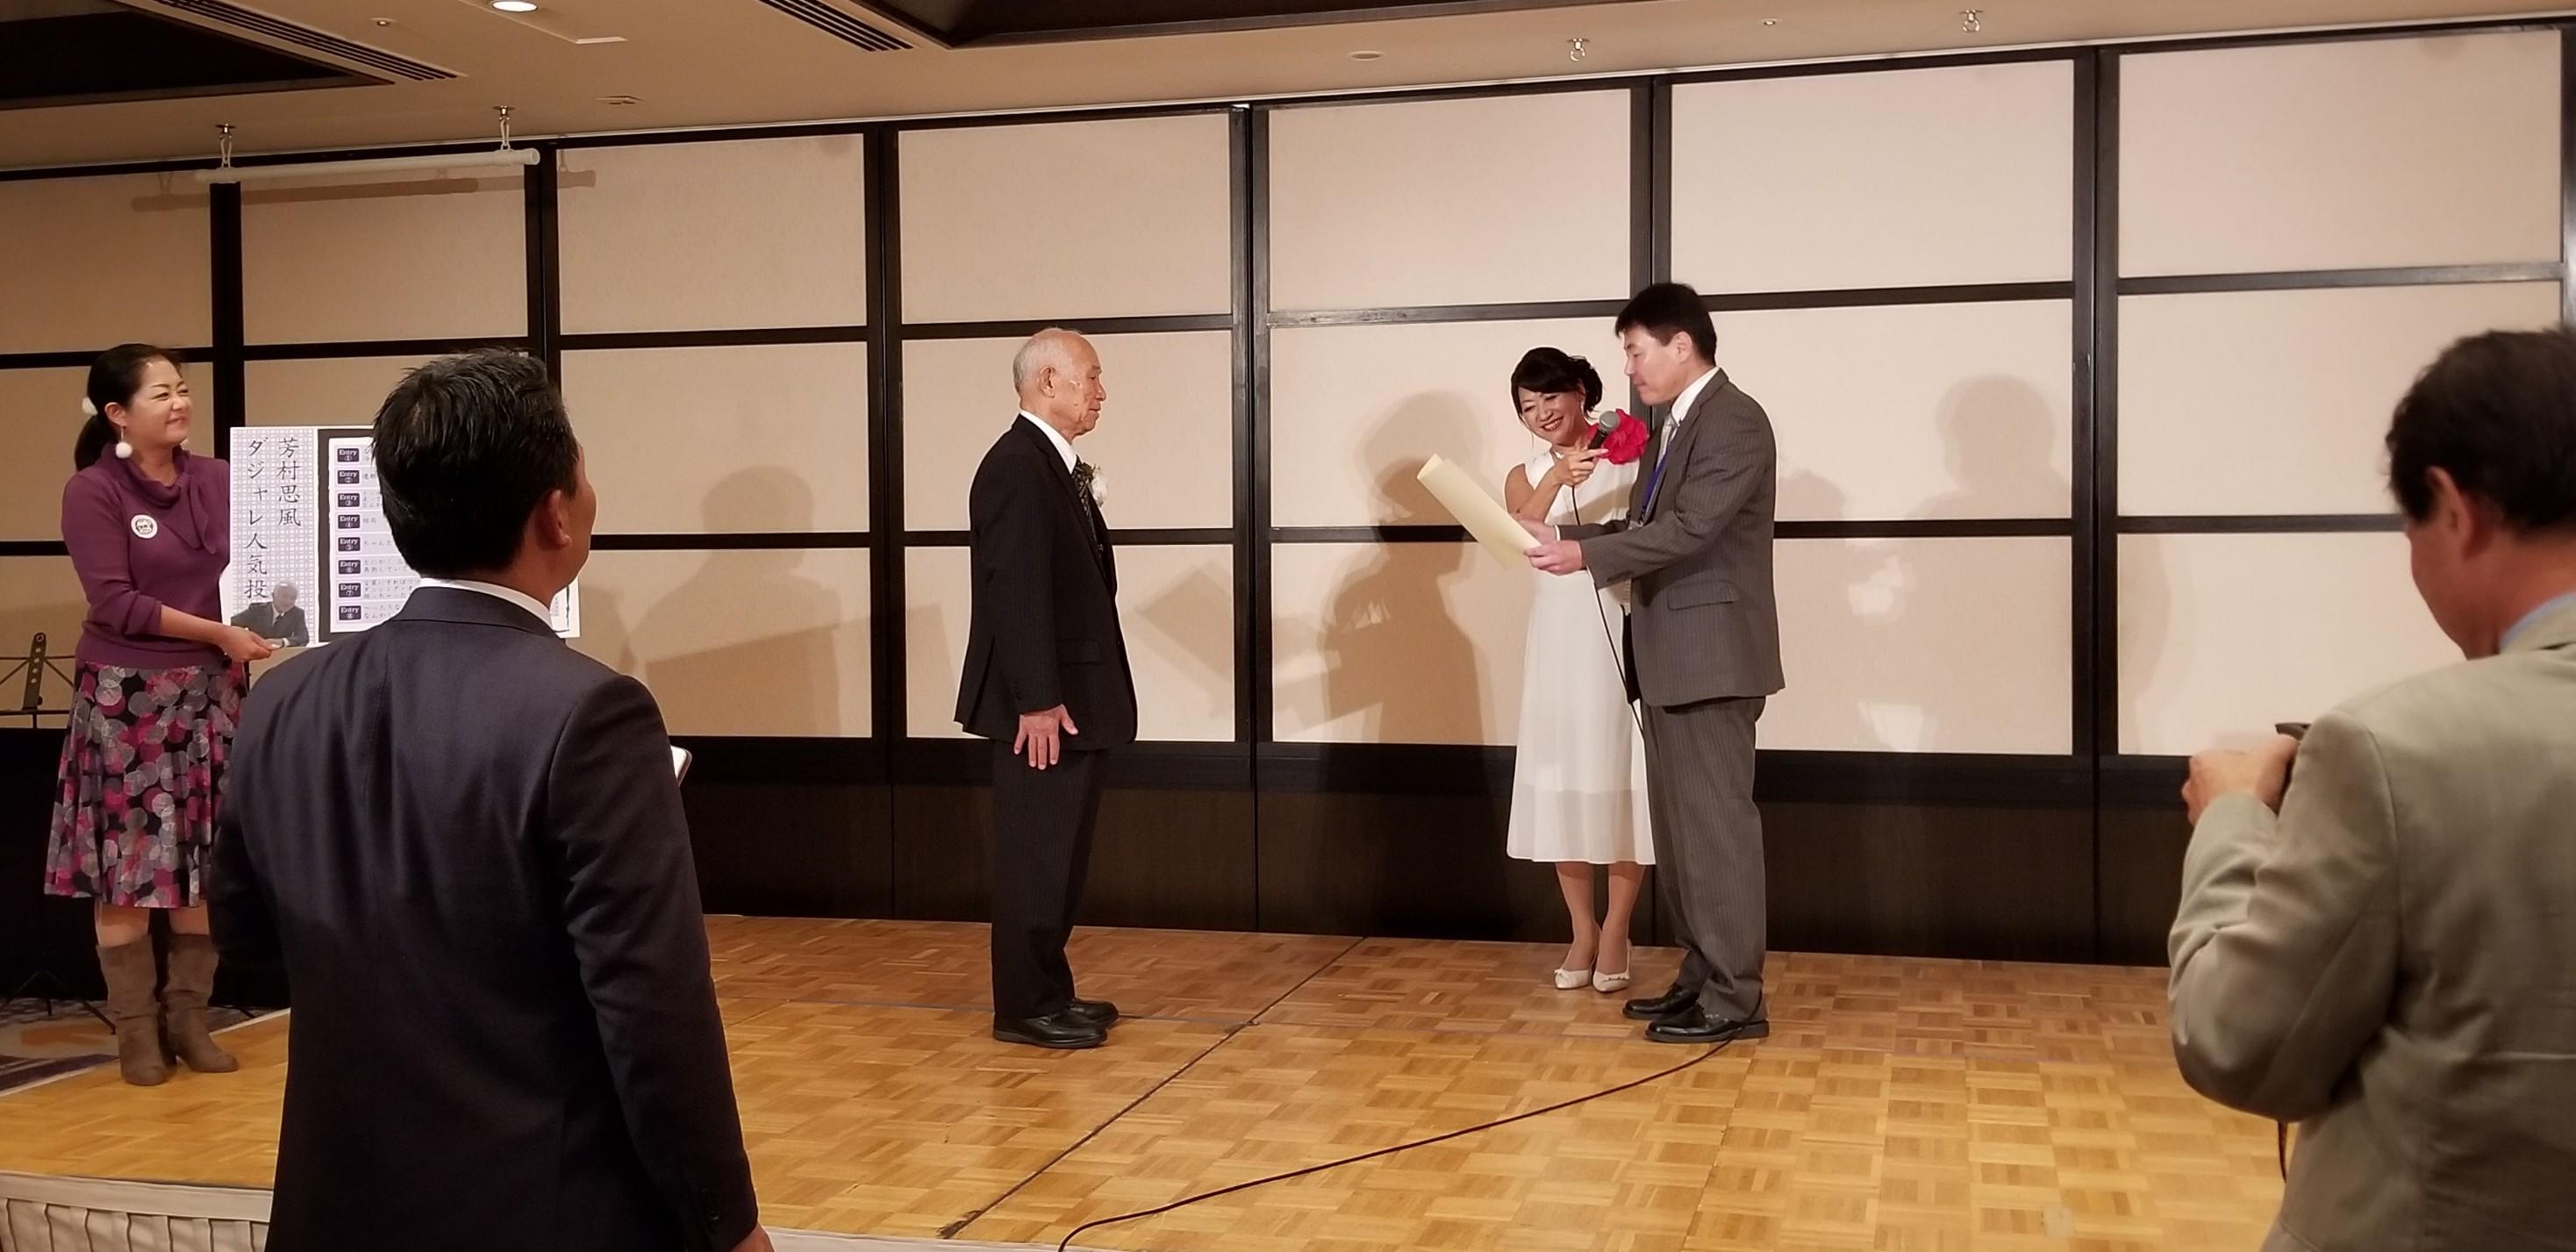 7960e1db1f4cdbf54a60c36bd99acced - 第6回思風会全国大会2018in東京開催